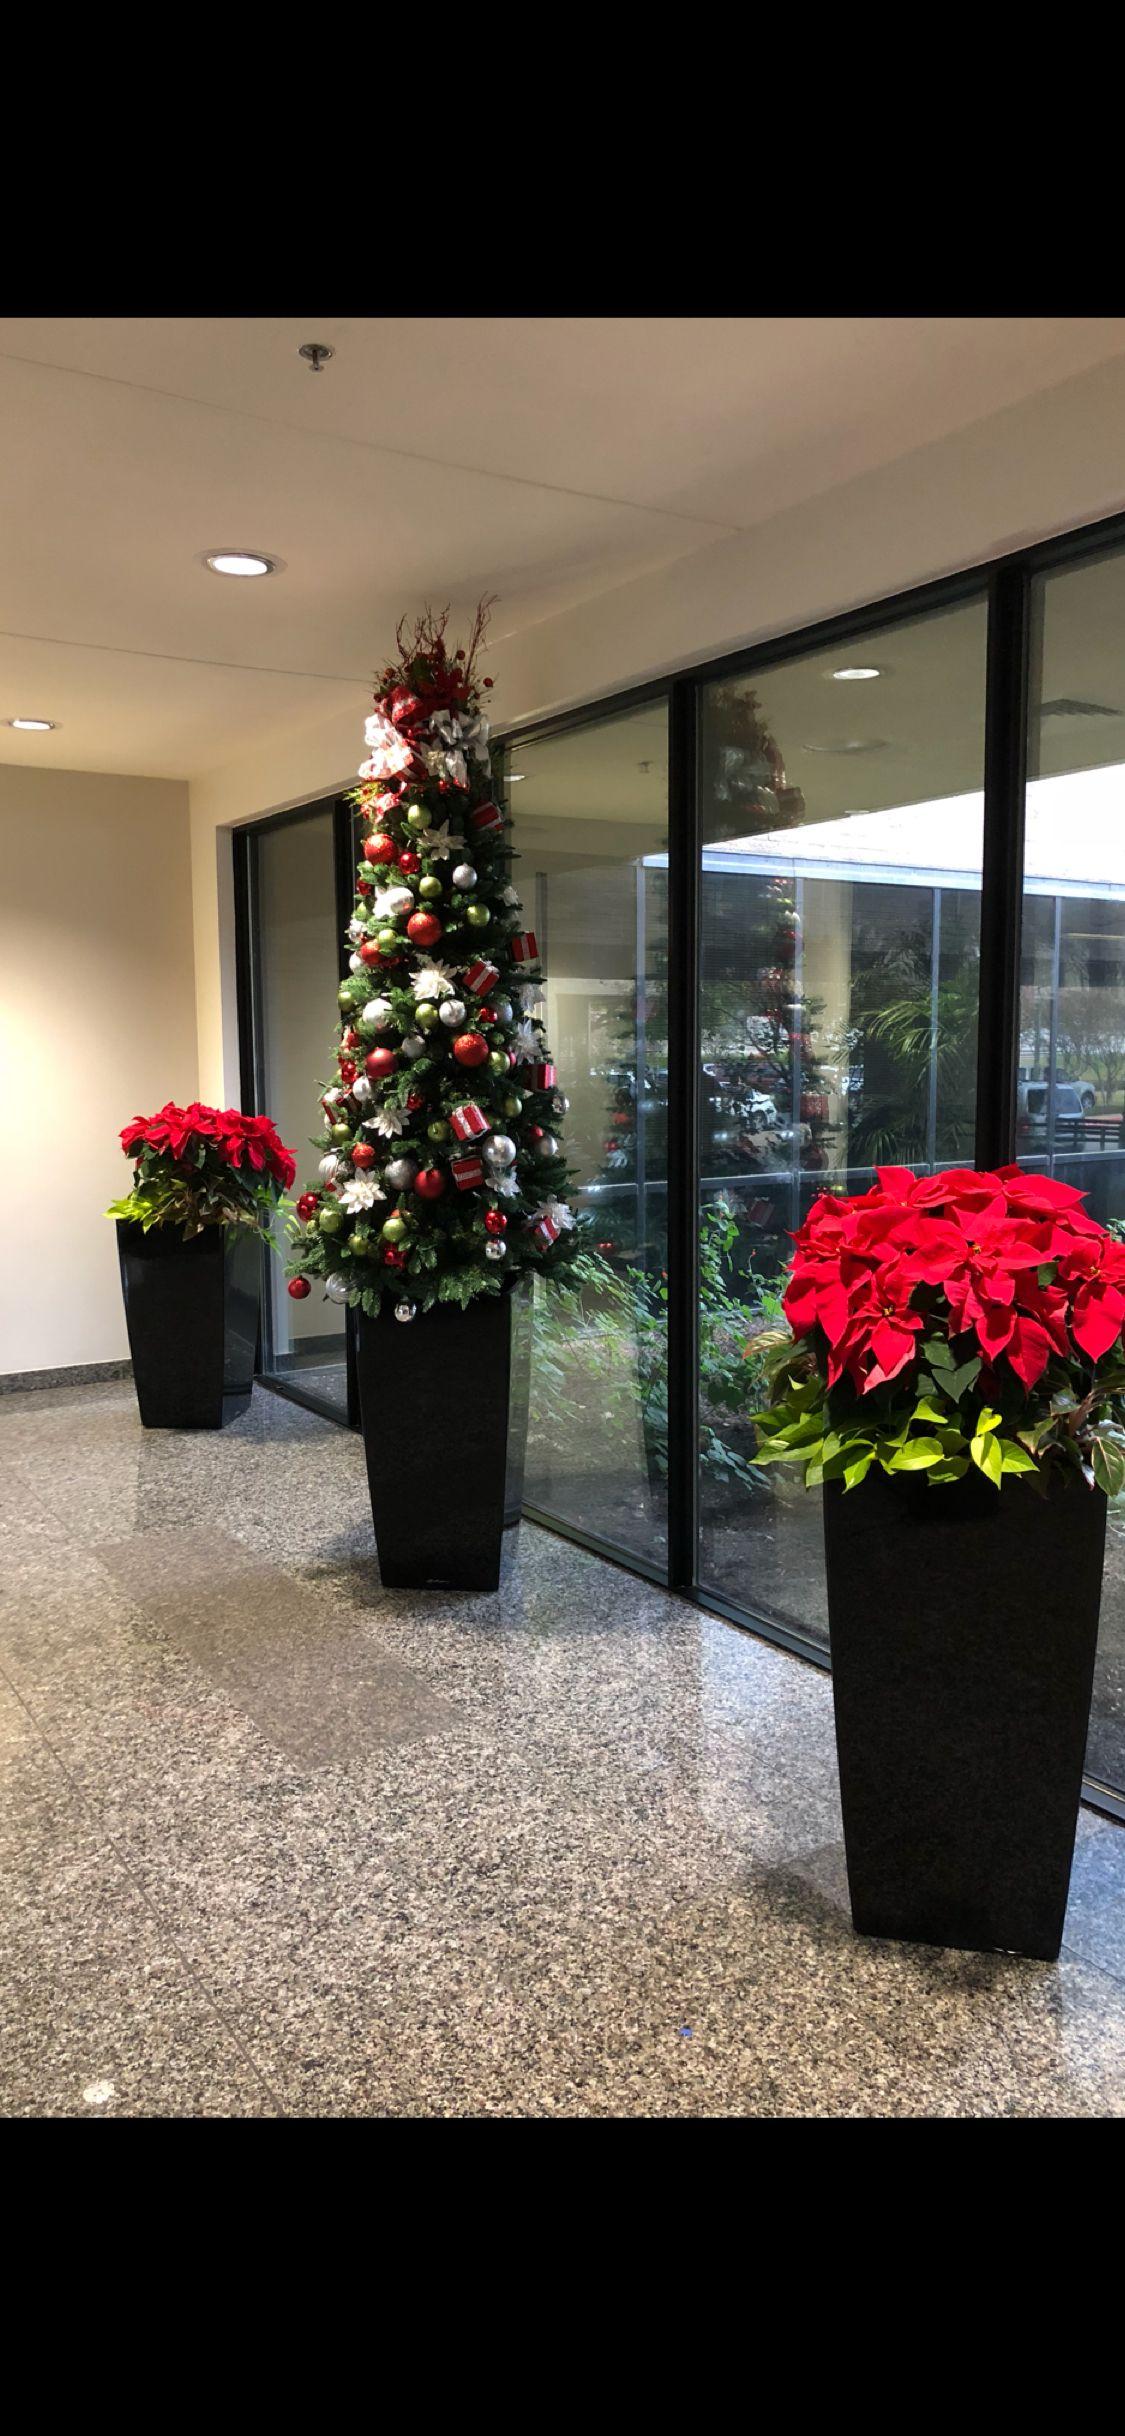 POINSETTIAPOINSETTIAS & LIVE CHRISTMAS TREE Holiday